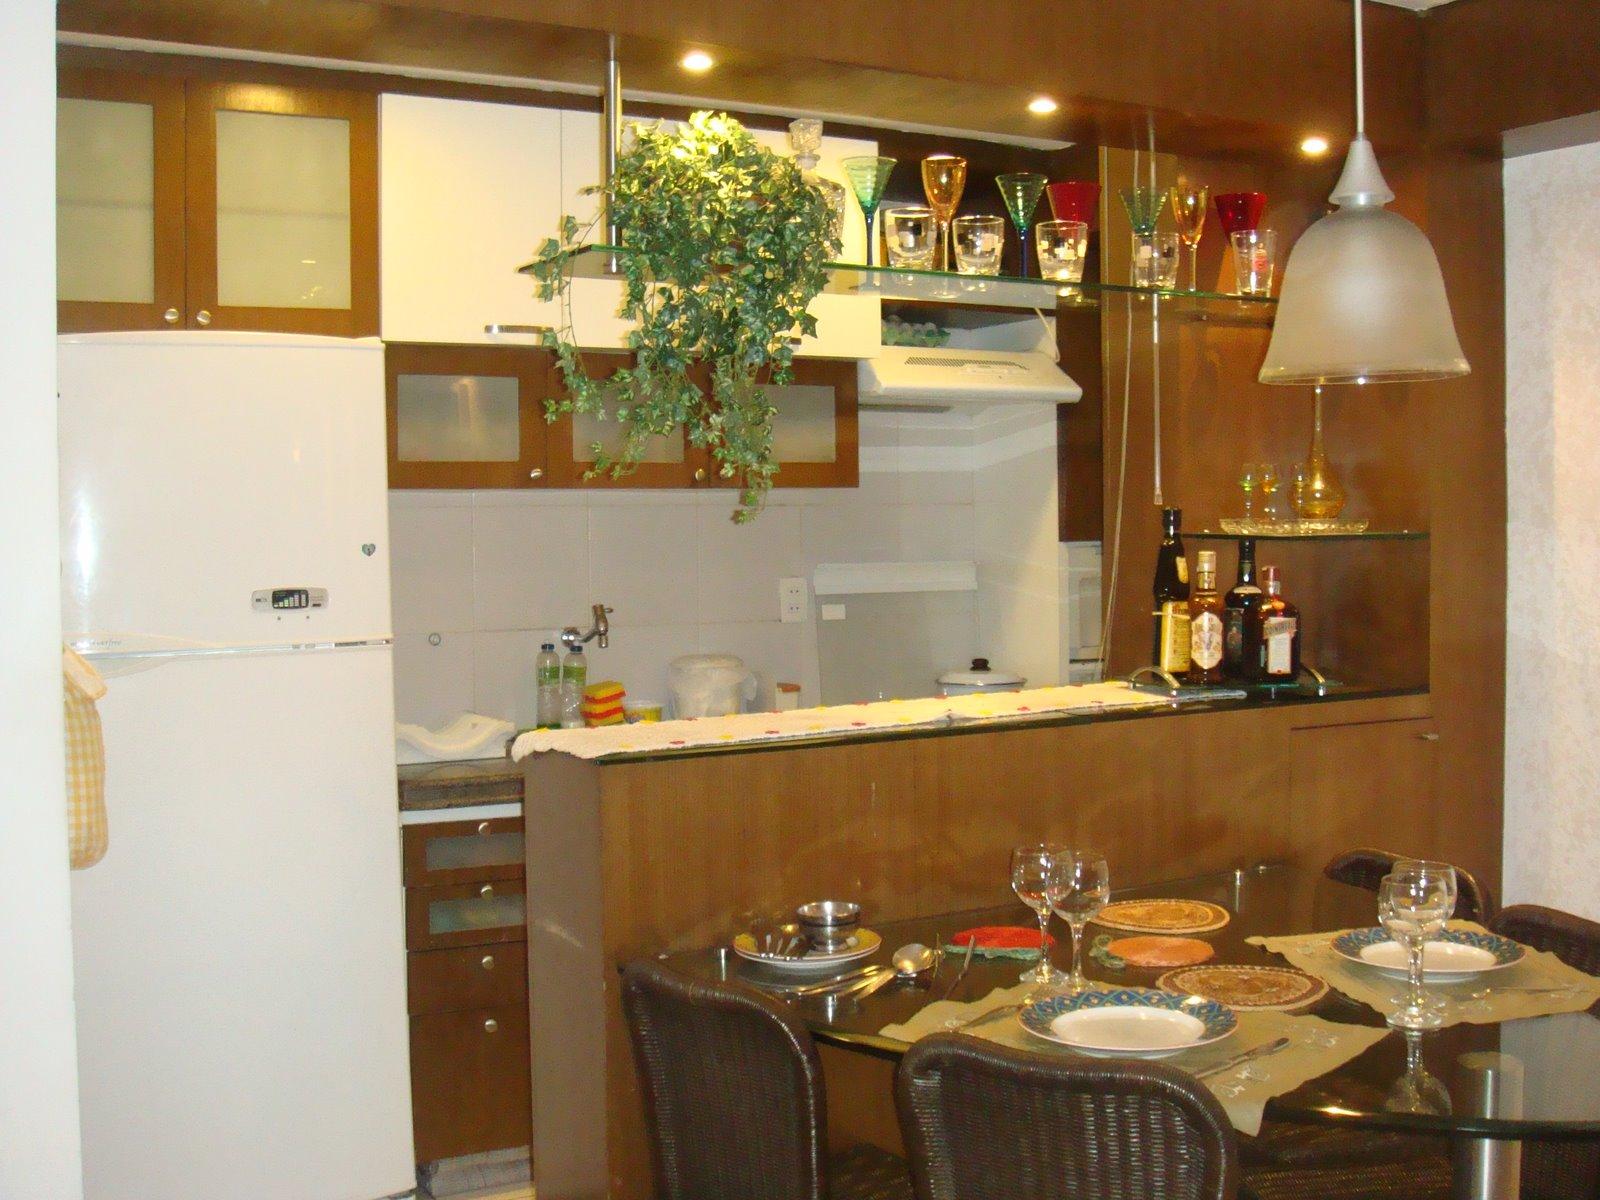 CozinhaAmericanaIdealparaCozinhasPequenasjpg